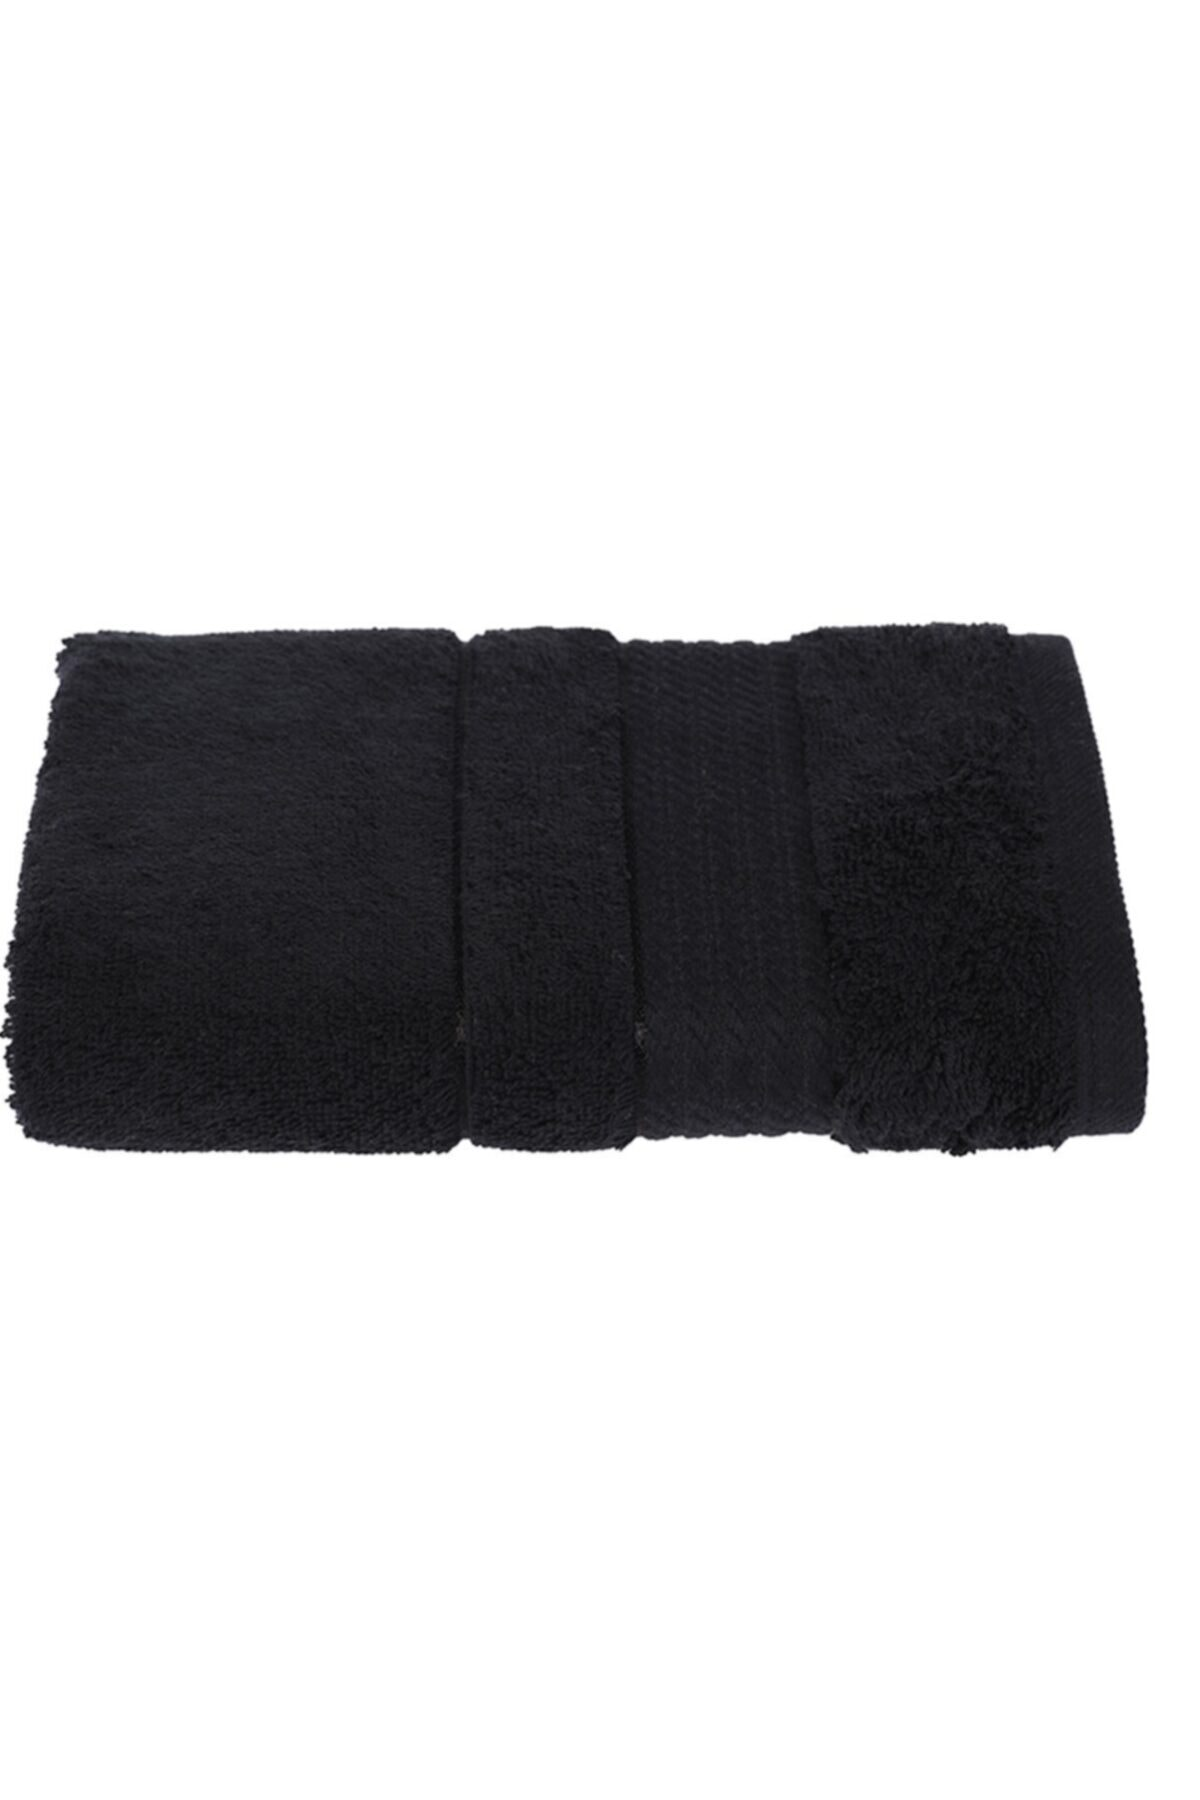 Siyah Soft Pamuk El-yüz Havlusu